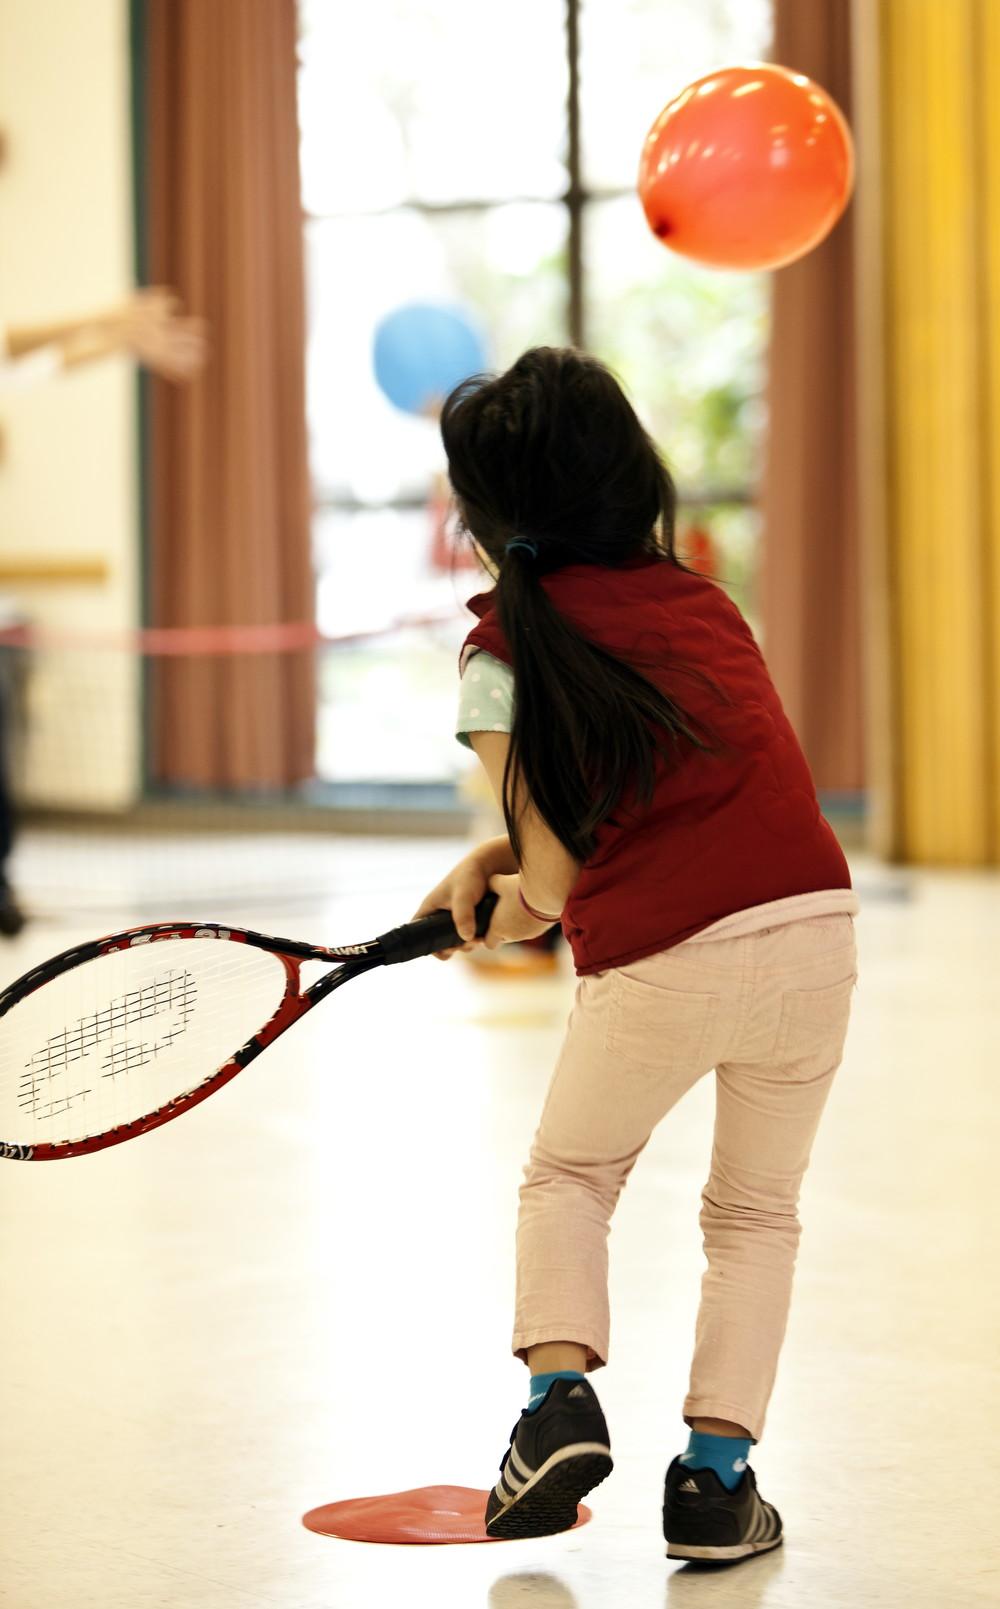 Girl swinging at balloon.jpg